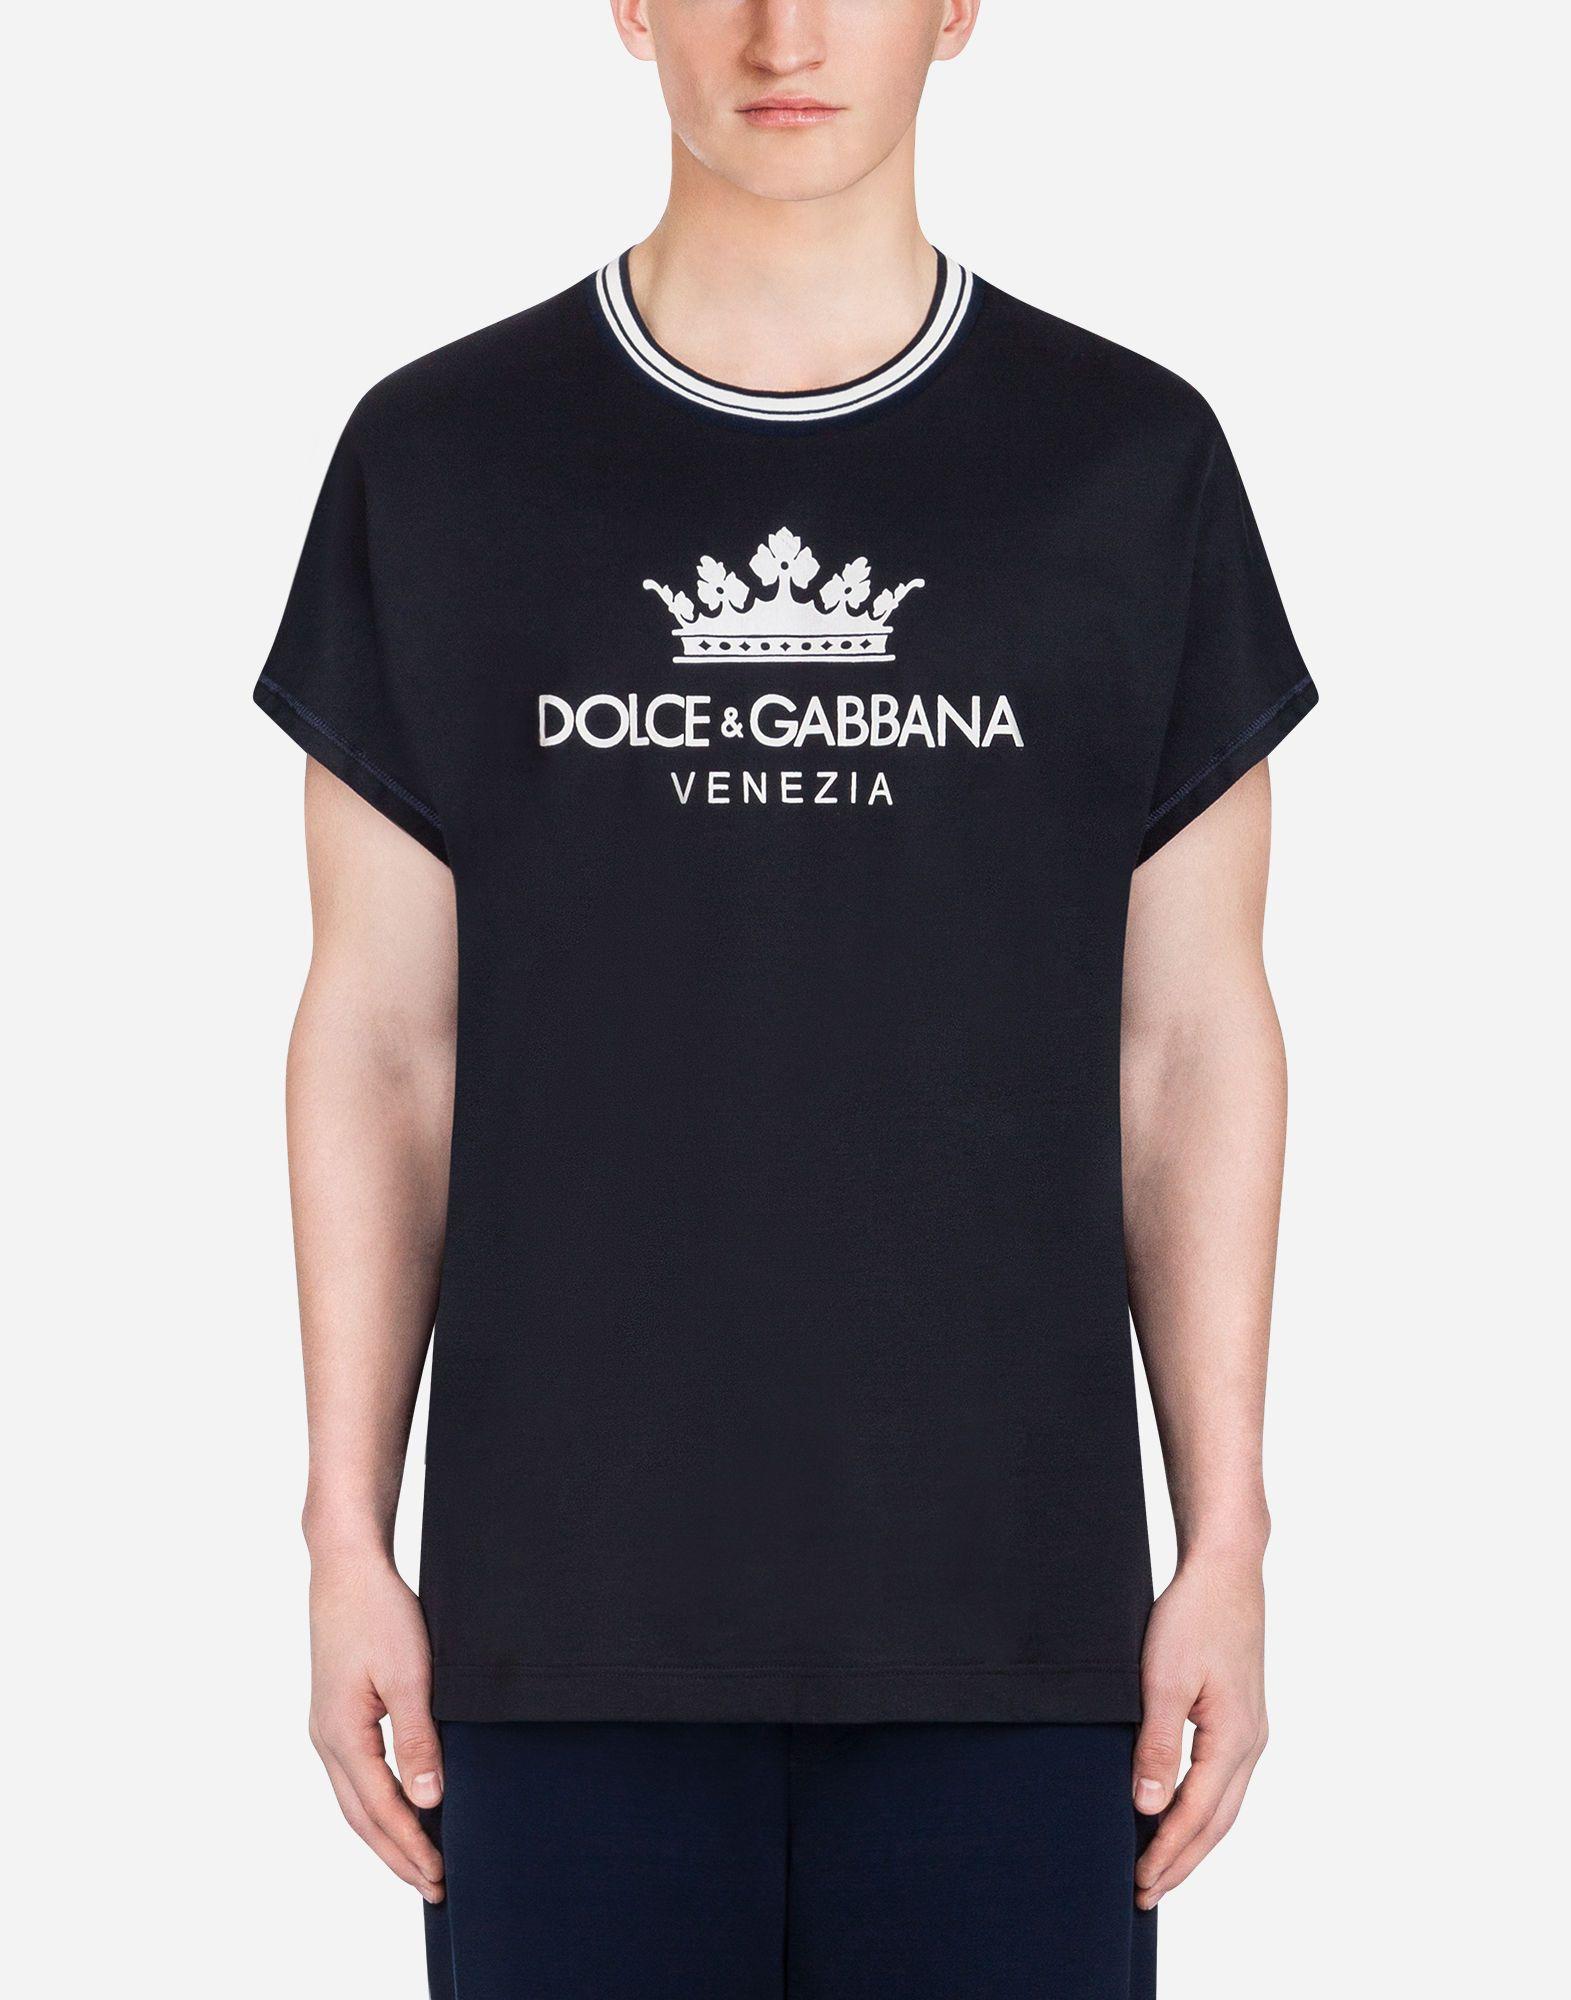 Southampton Choose Life T-Shirt Mens